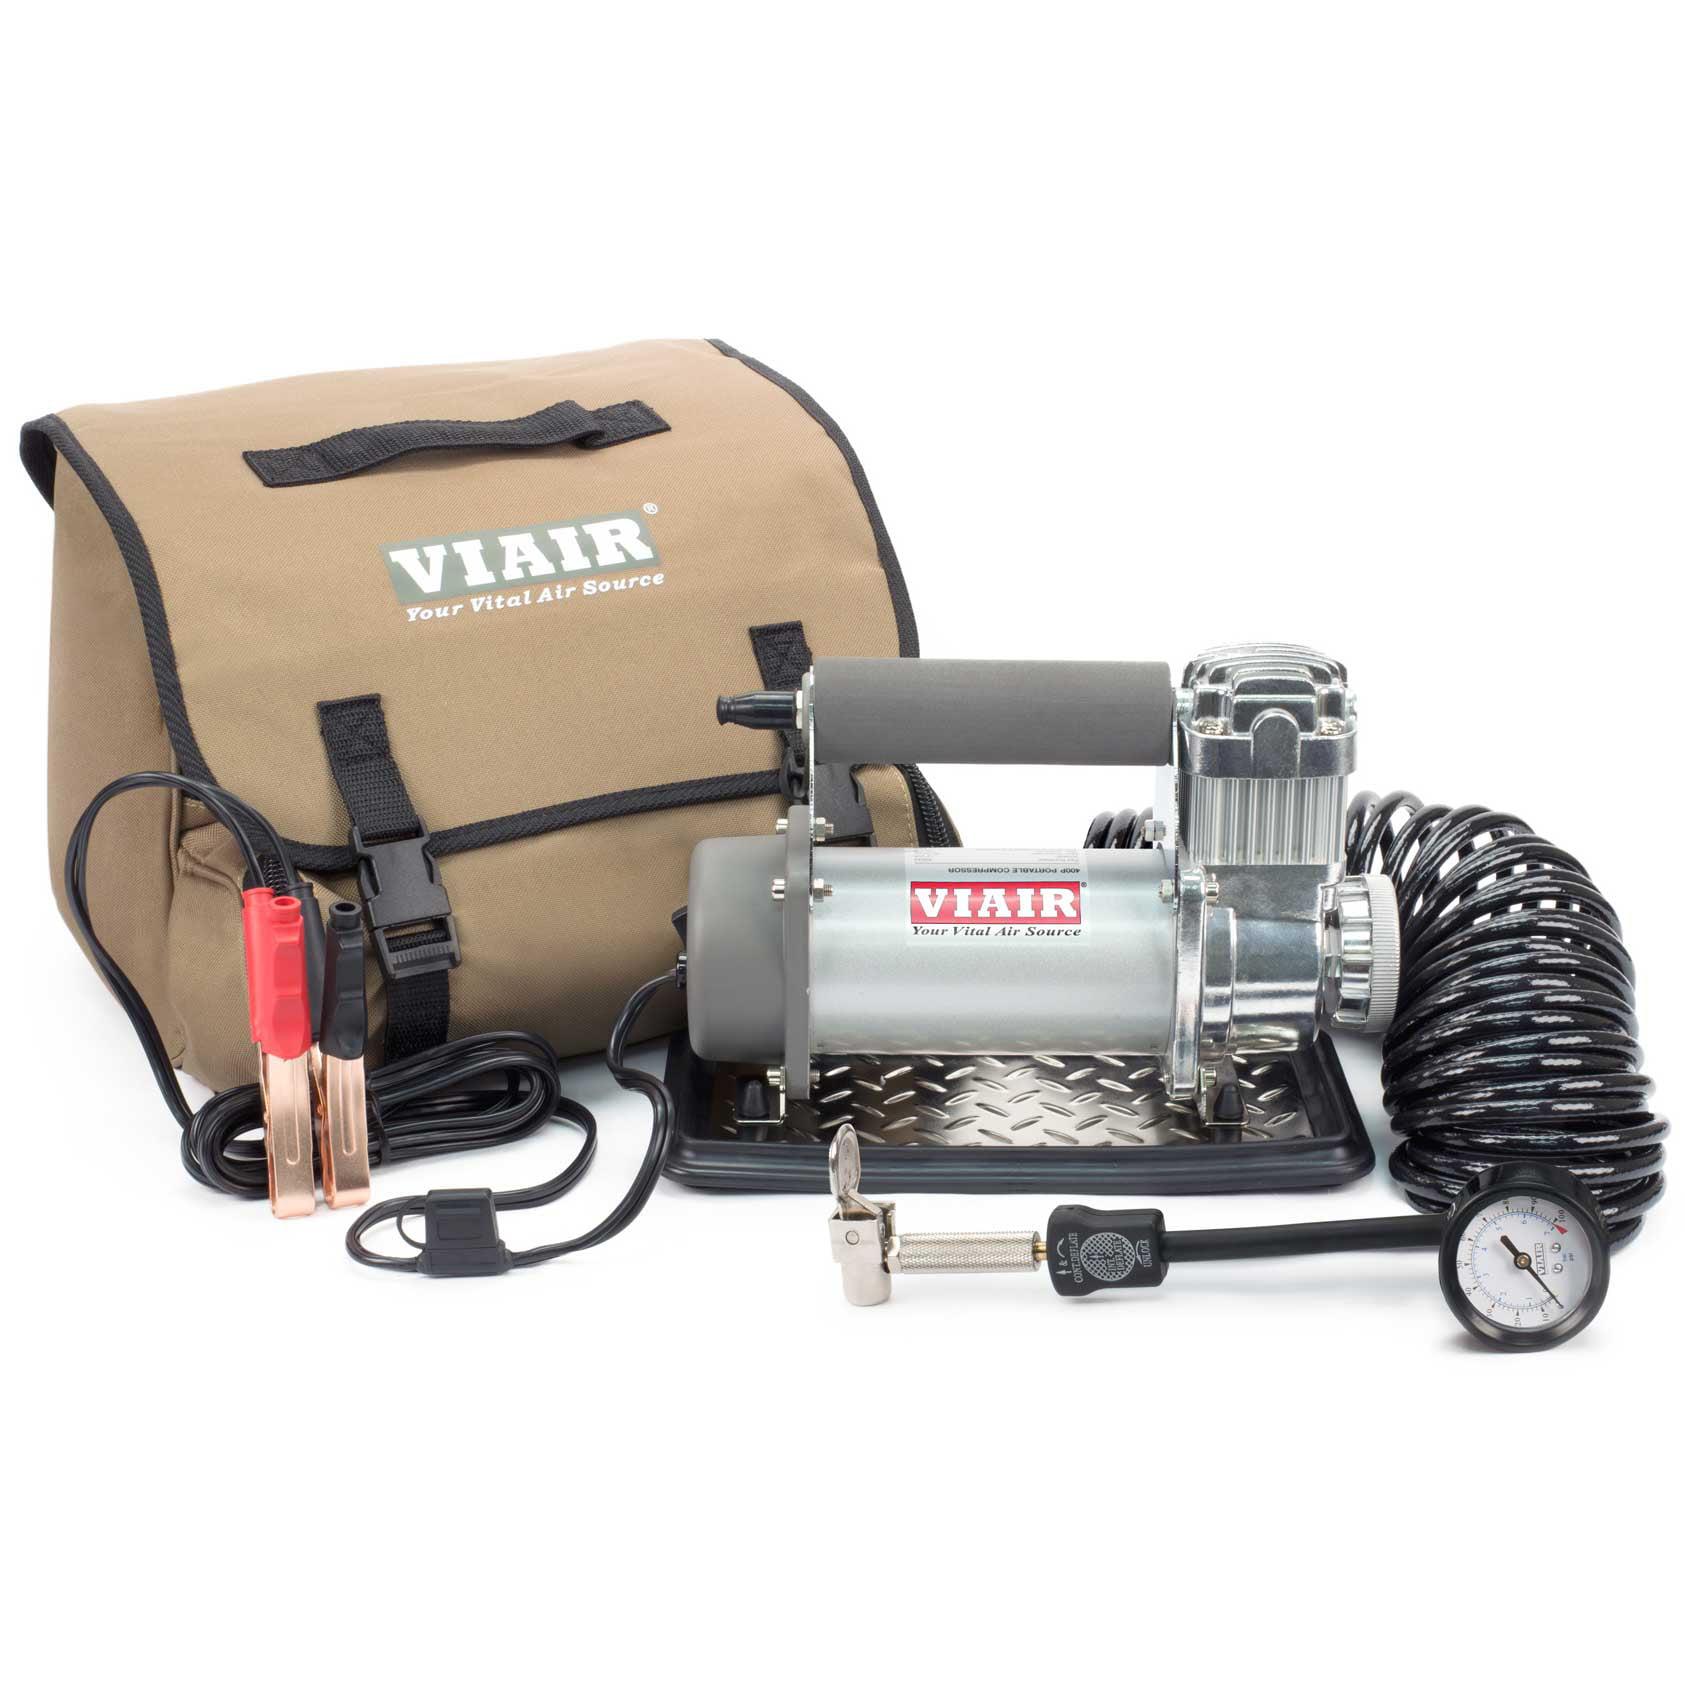 Viair 400P Portable 12V 33% Duty 150 PSI Compressor Kit for Tires up to 35